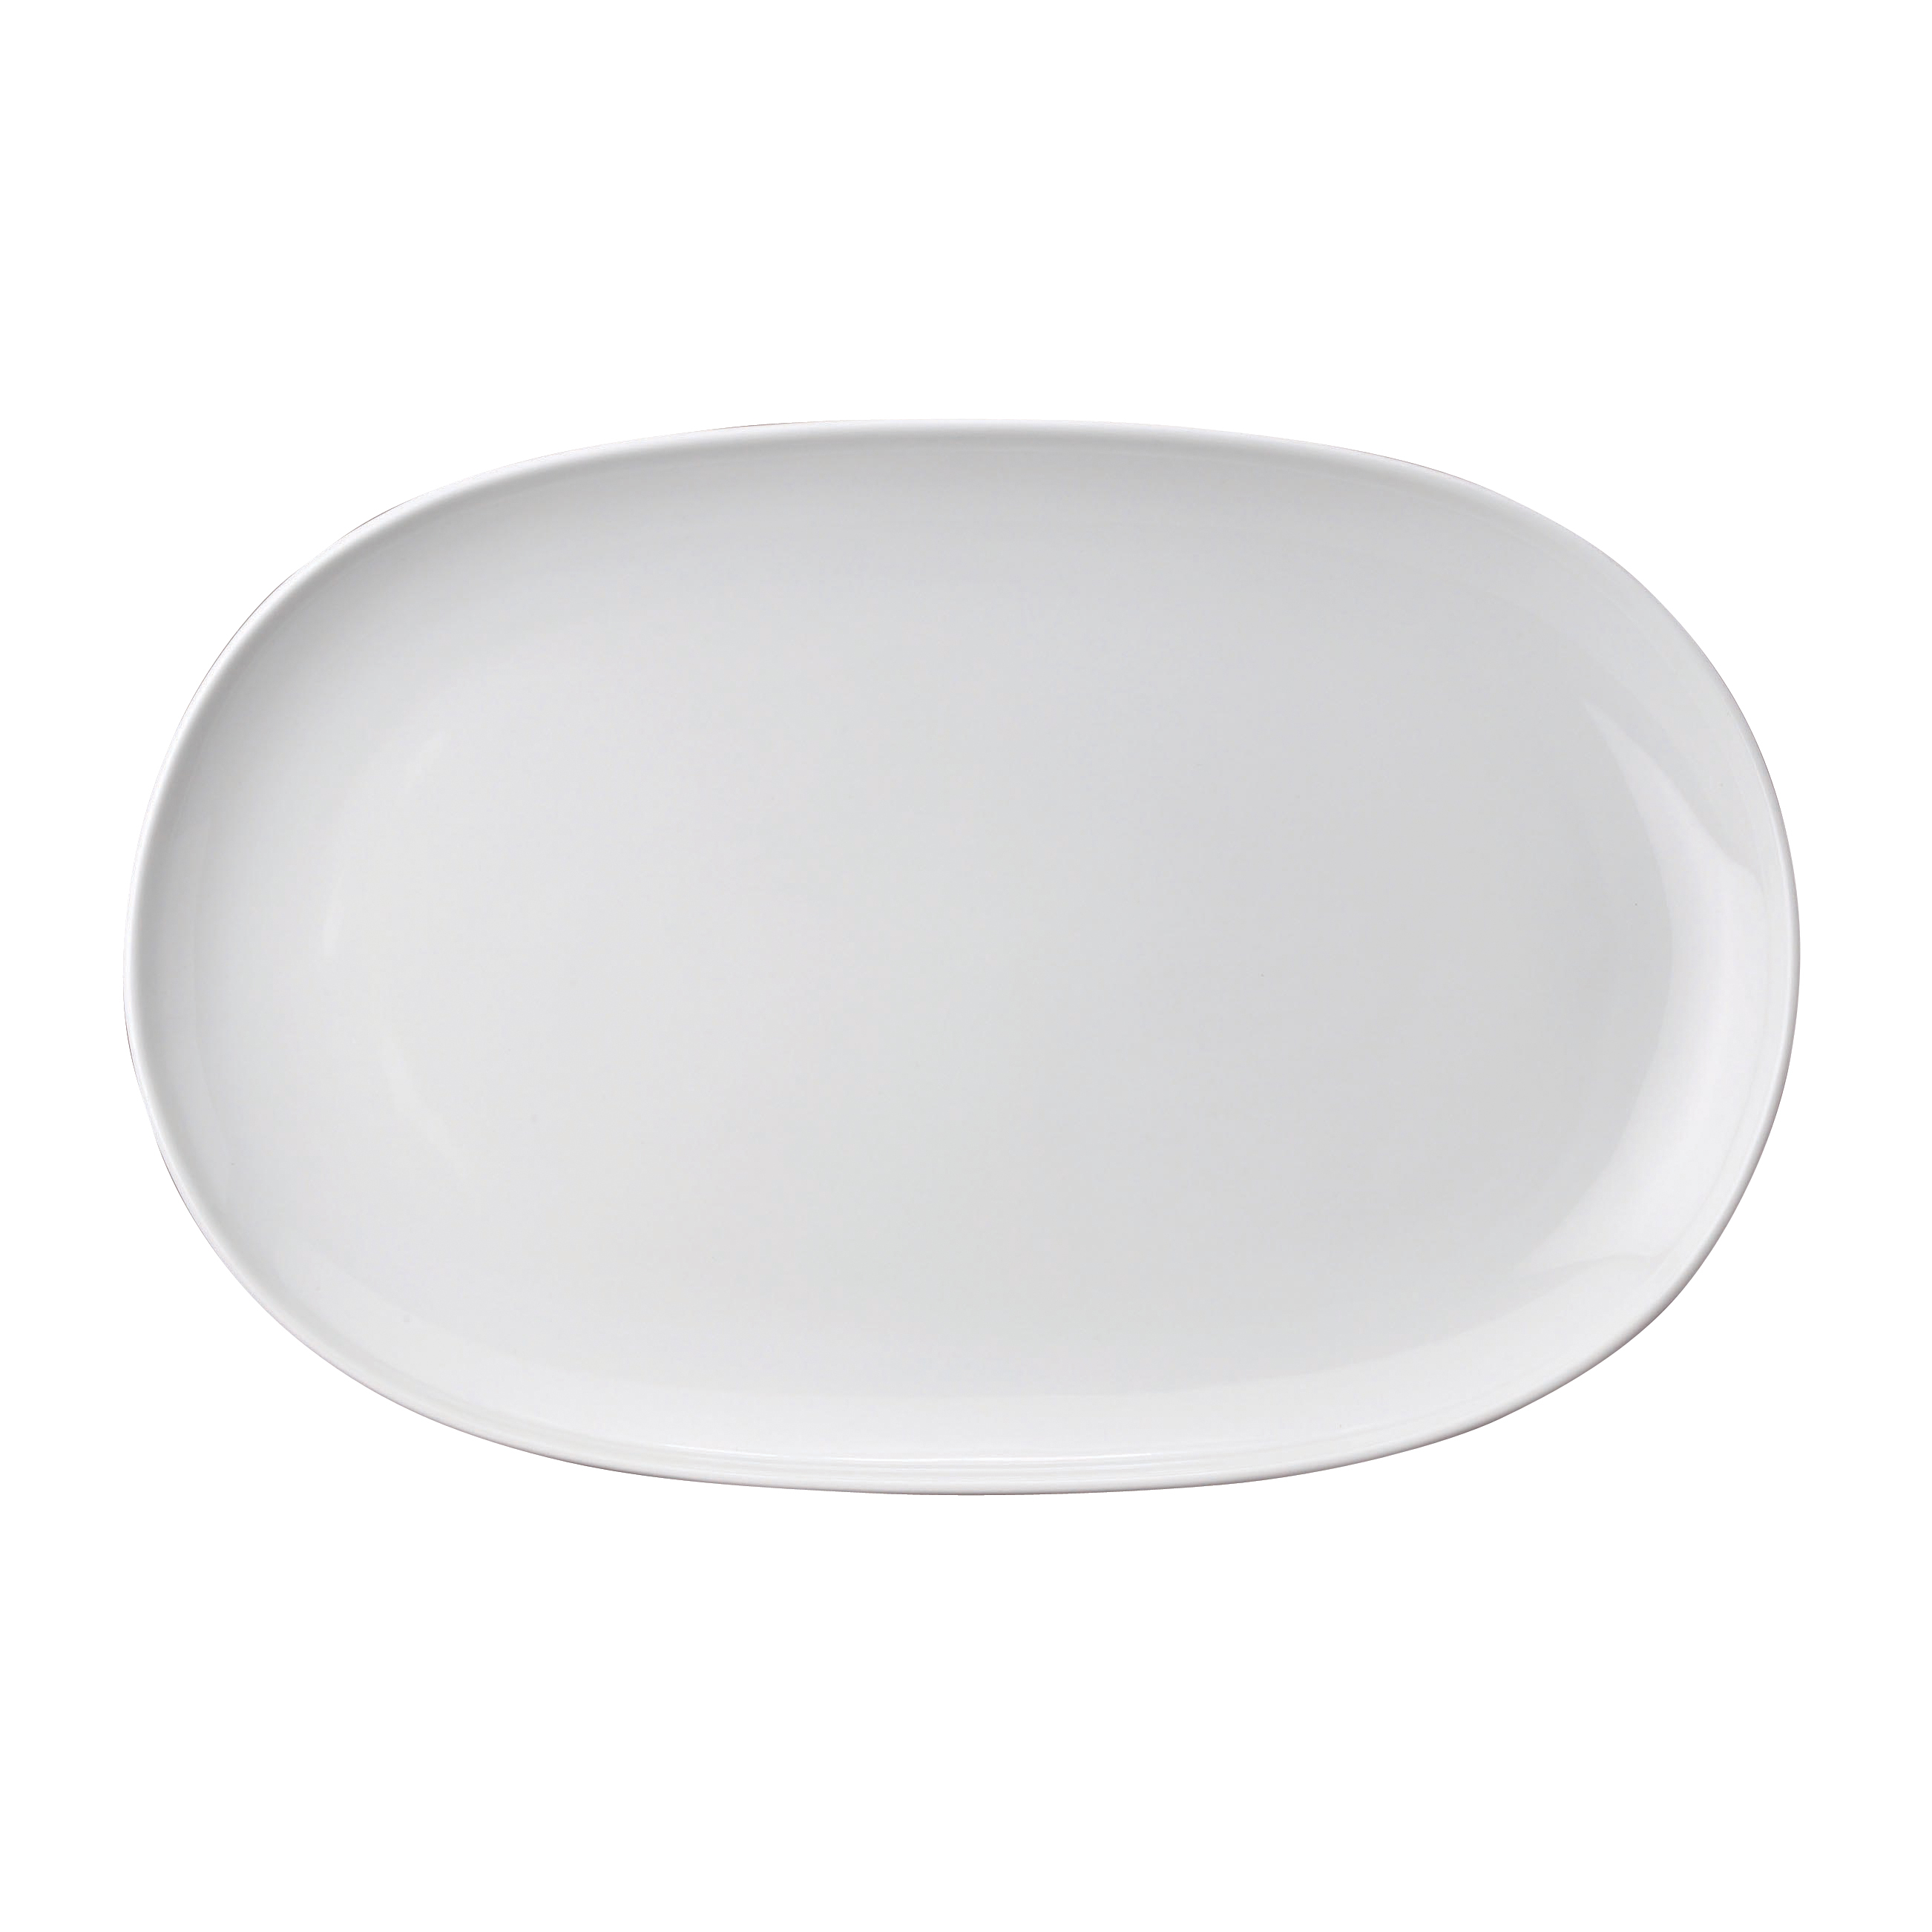 Harold Import Co. White Porcelain 14.25 x 9.25 Inch Oval Platter